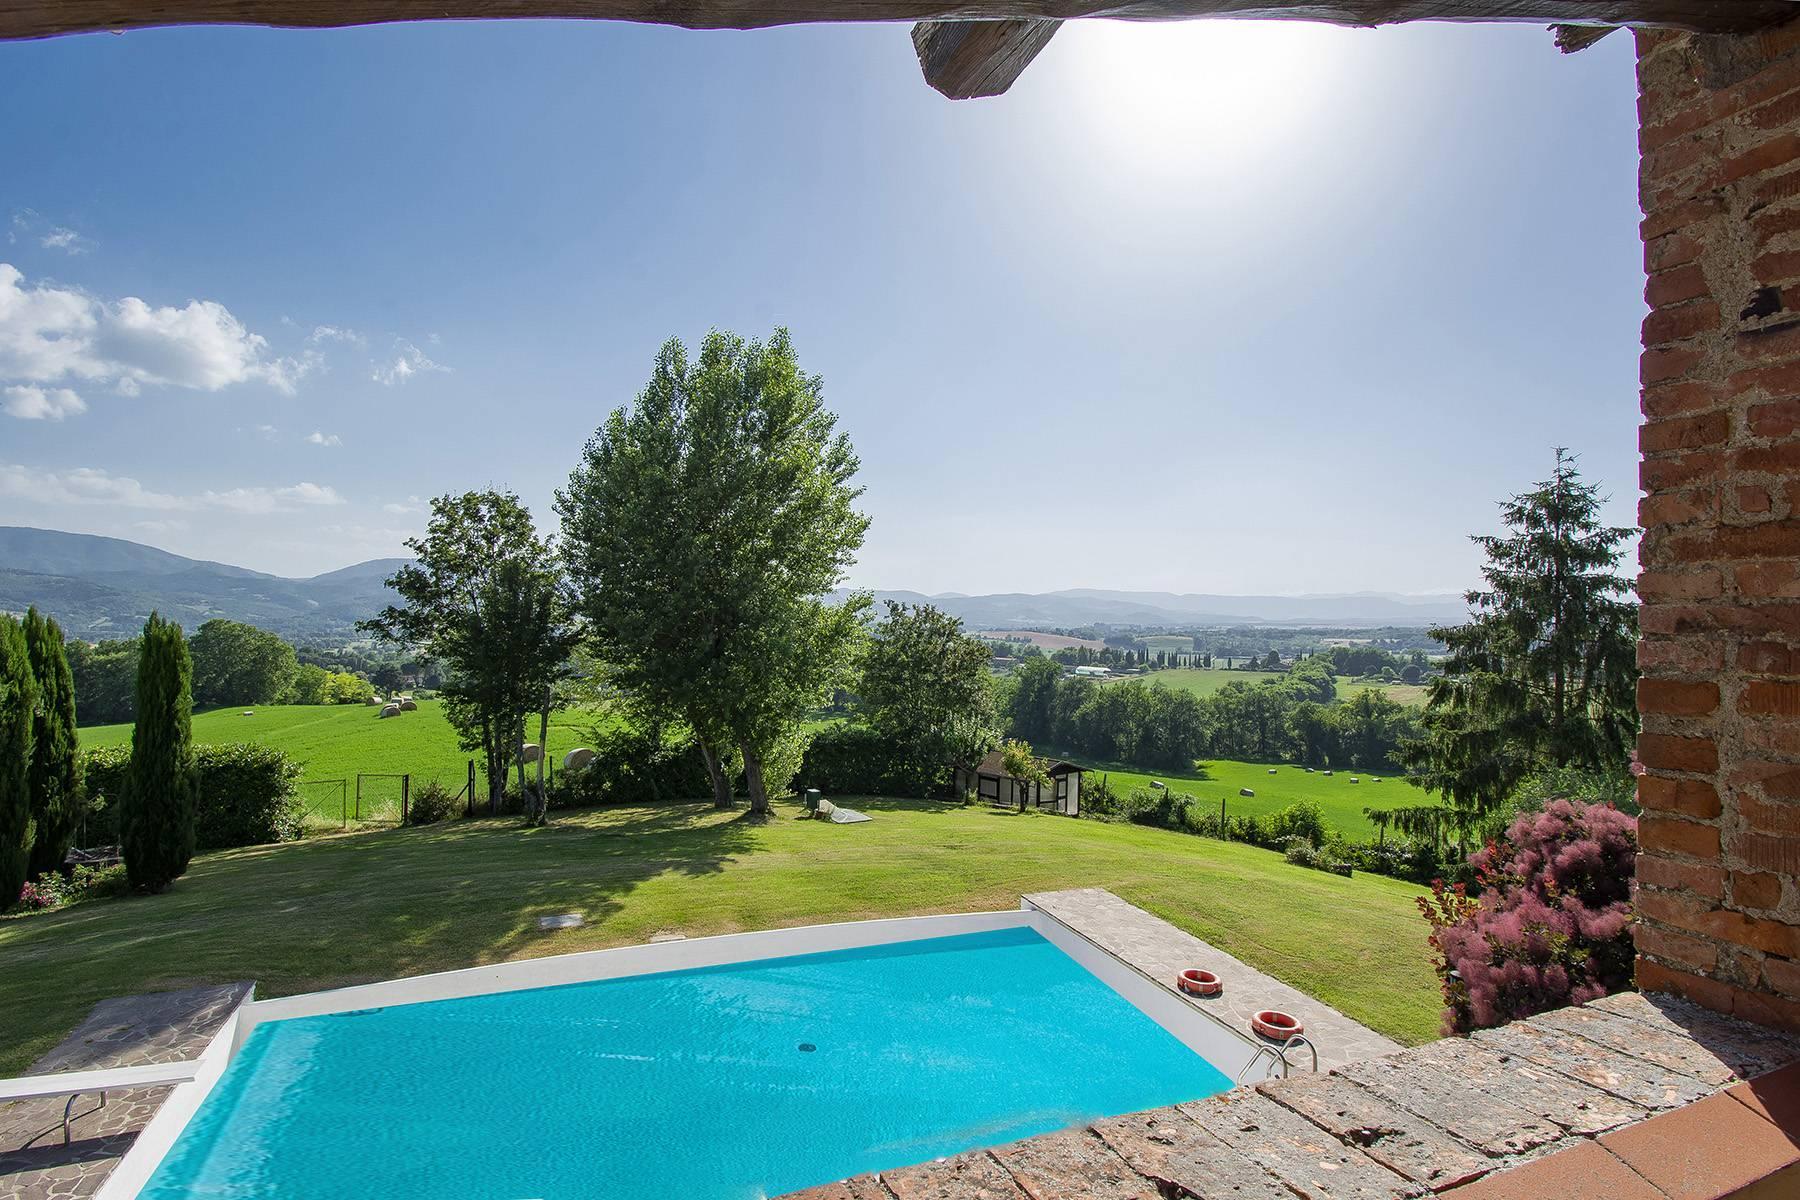 Farmhouse nestled on the Tuscan hills - 22